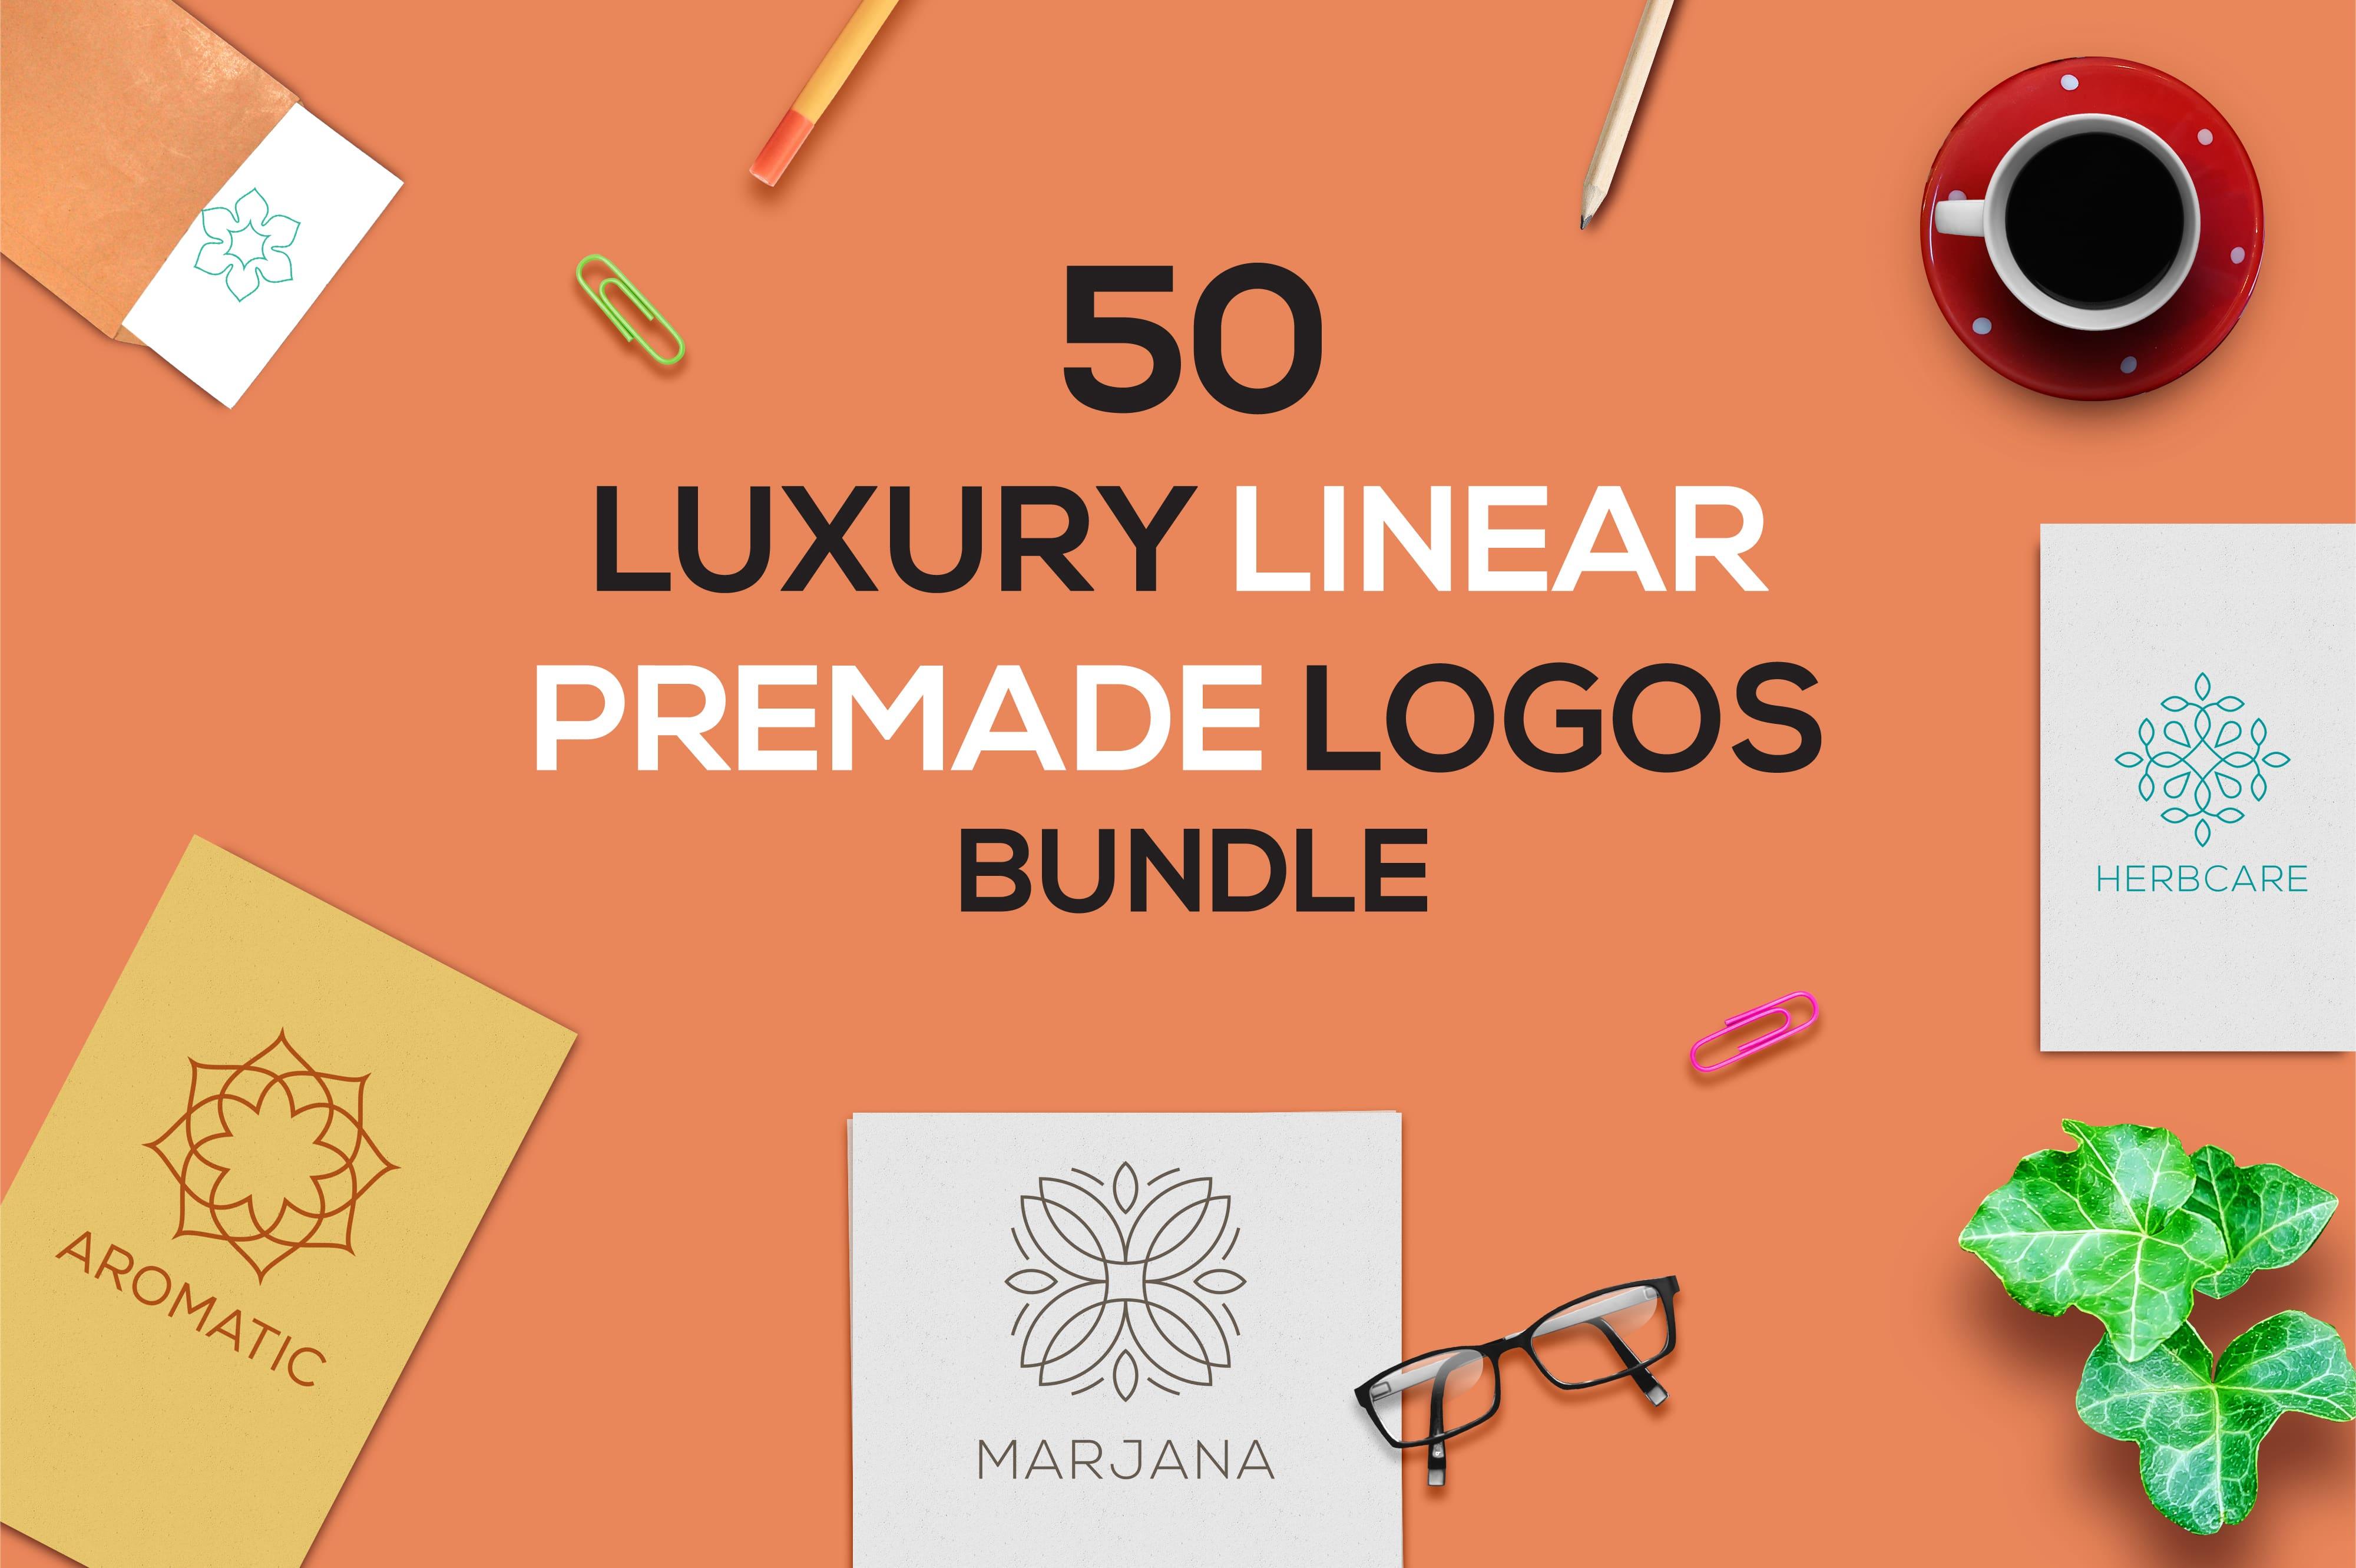 520 Premade Logo Bundle + Bonus - just $24 - D preview 01 min